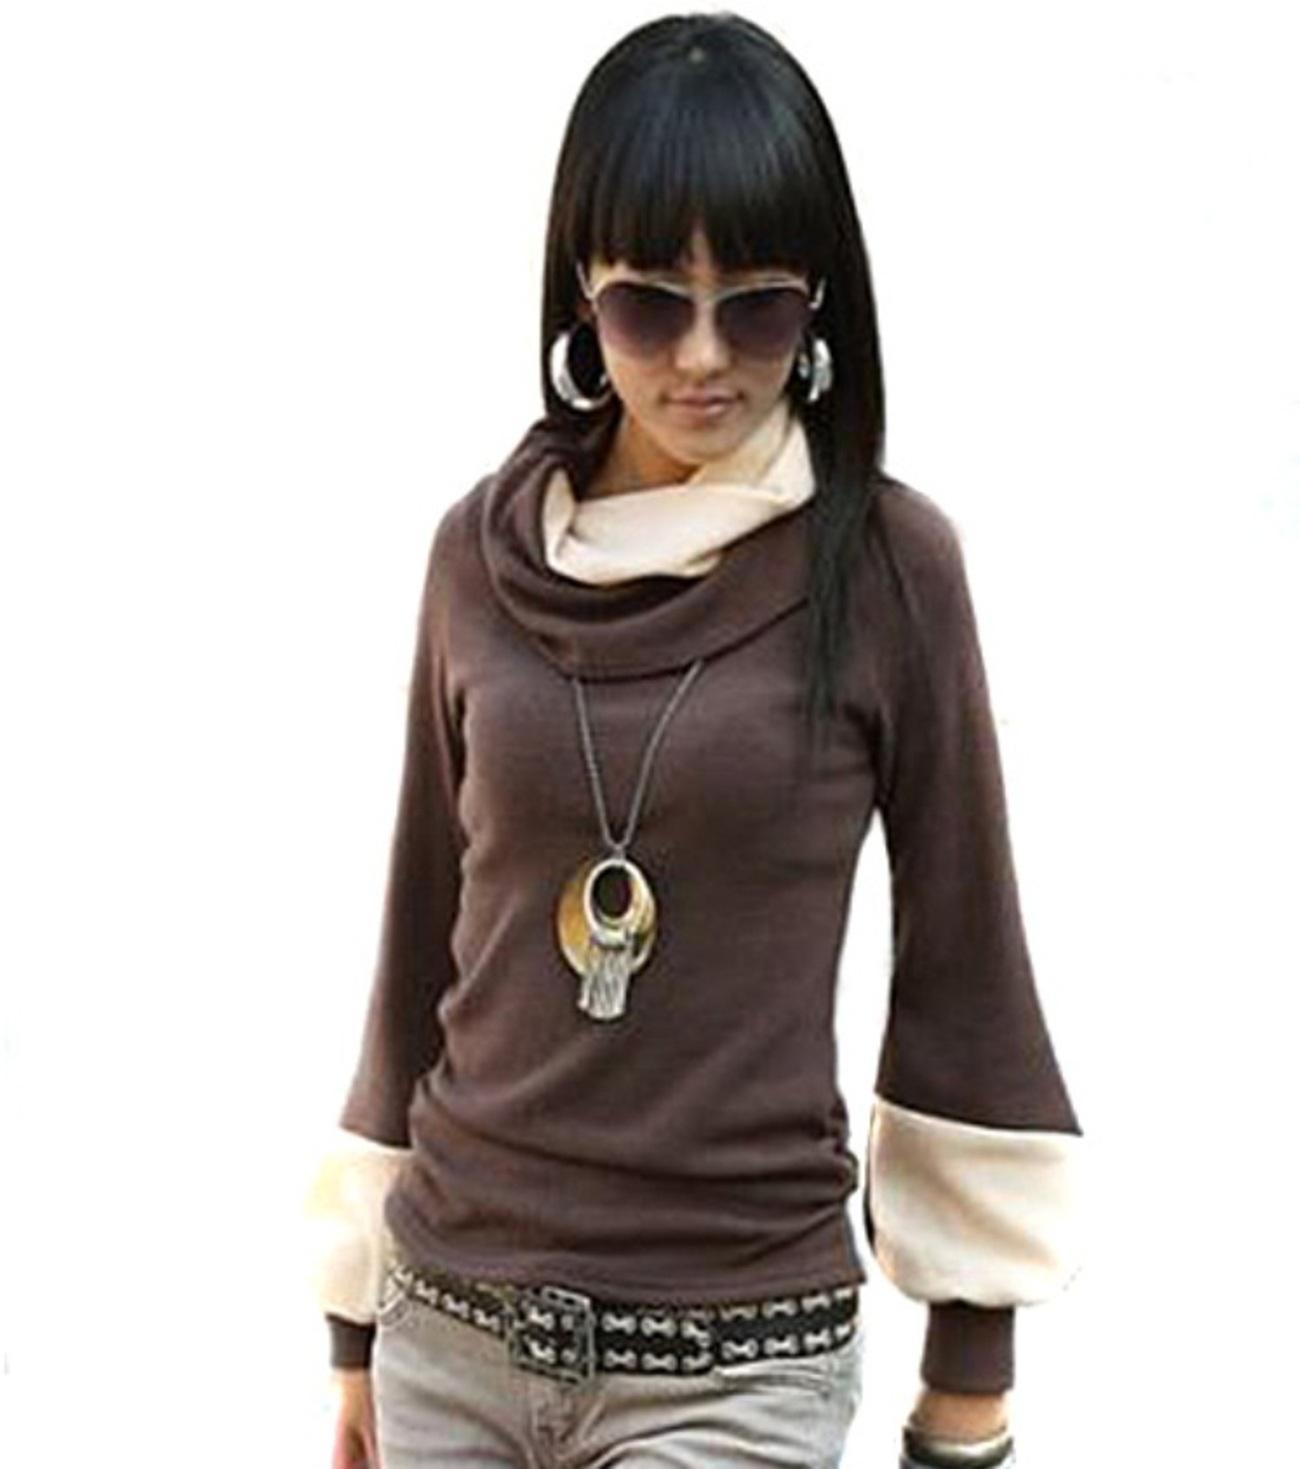 Damen Pullover Longshirt Sweatshirt Tunika Winter Pulli Shirt Sweater 40-42-44